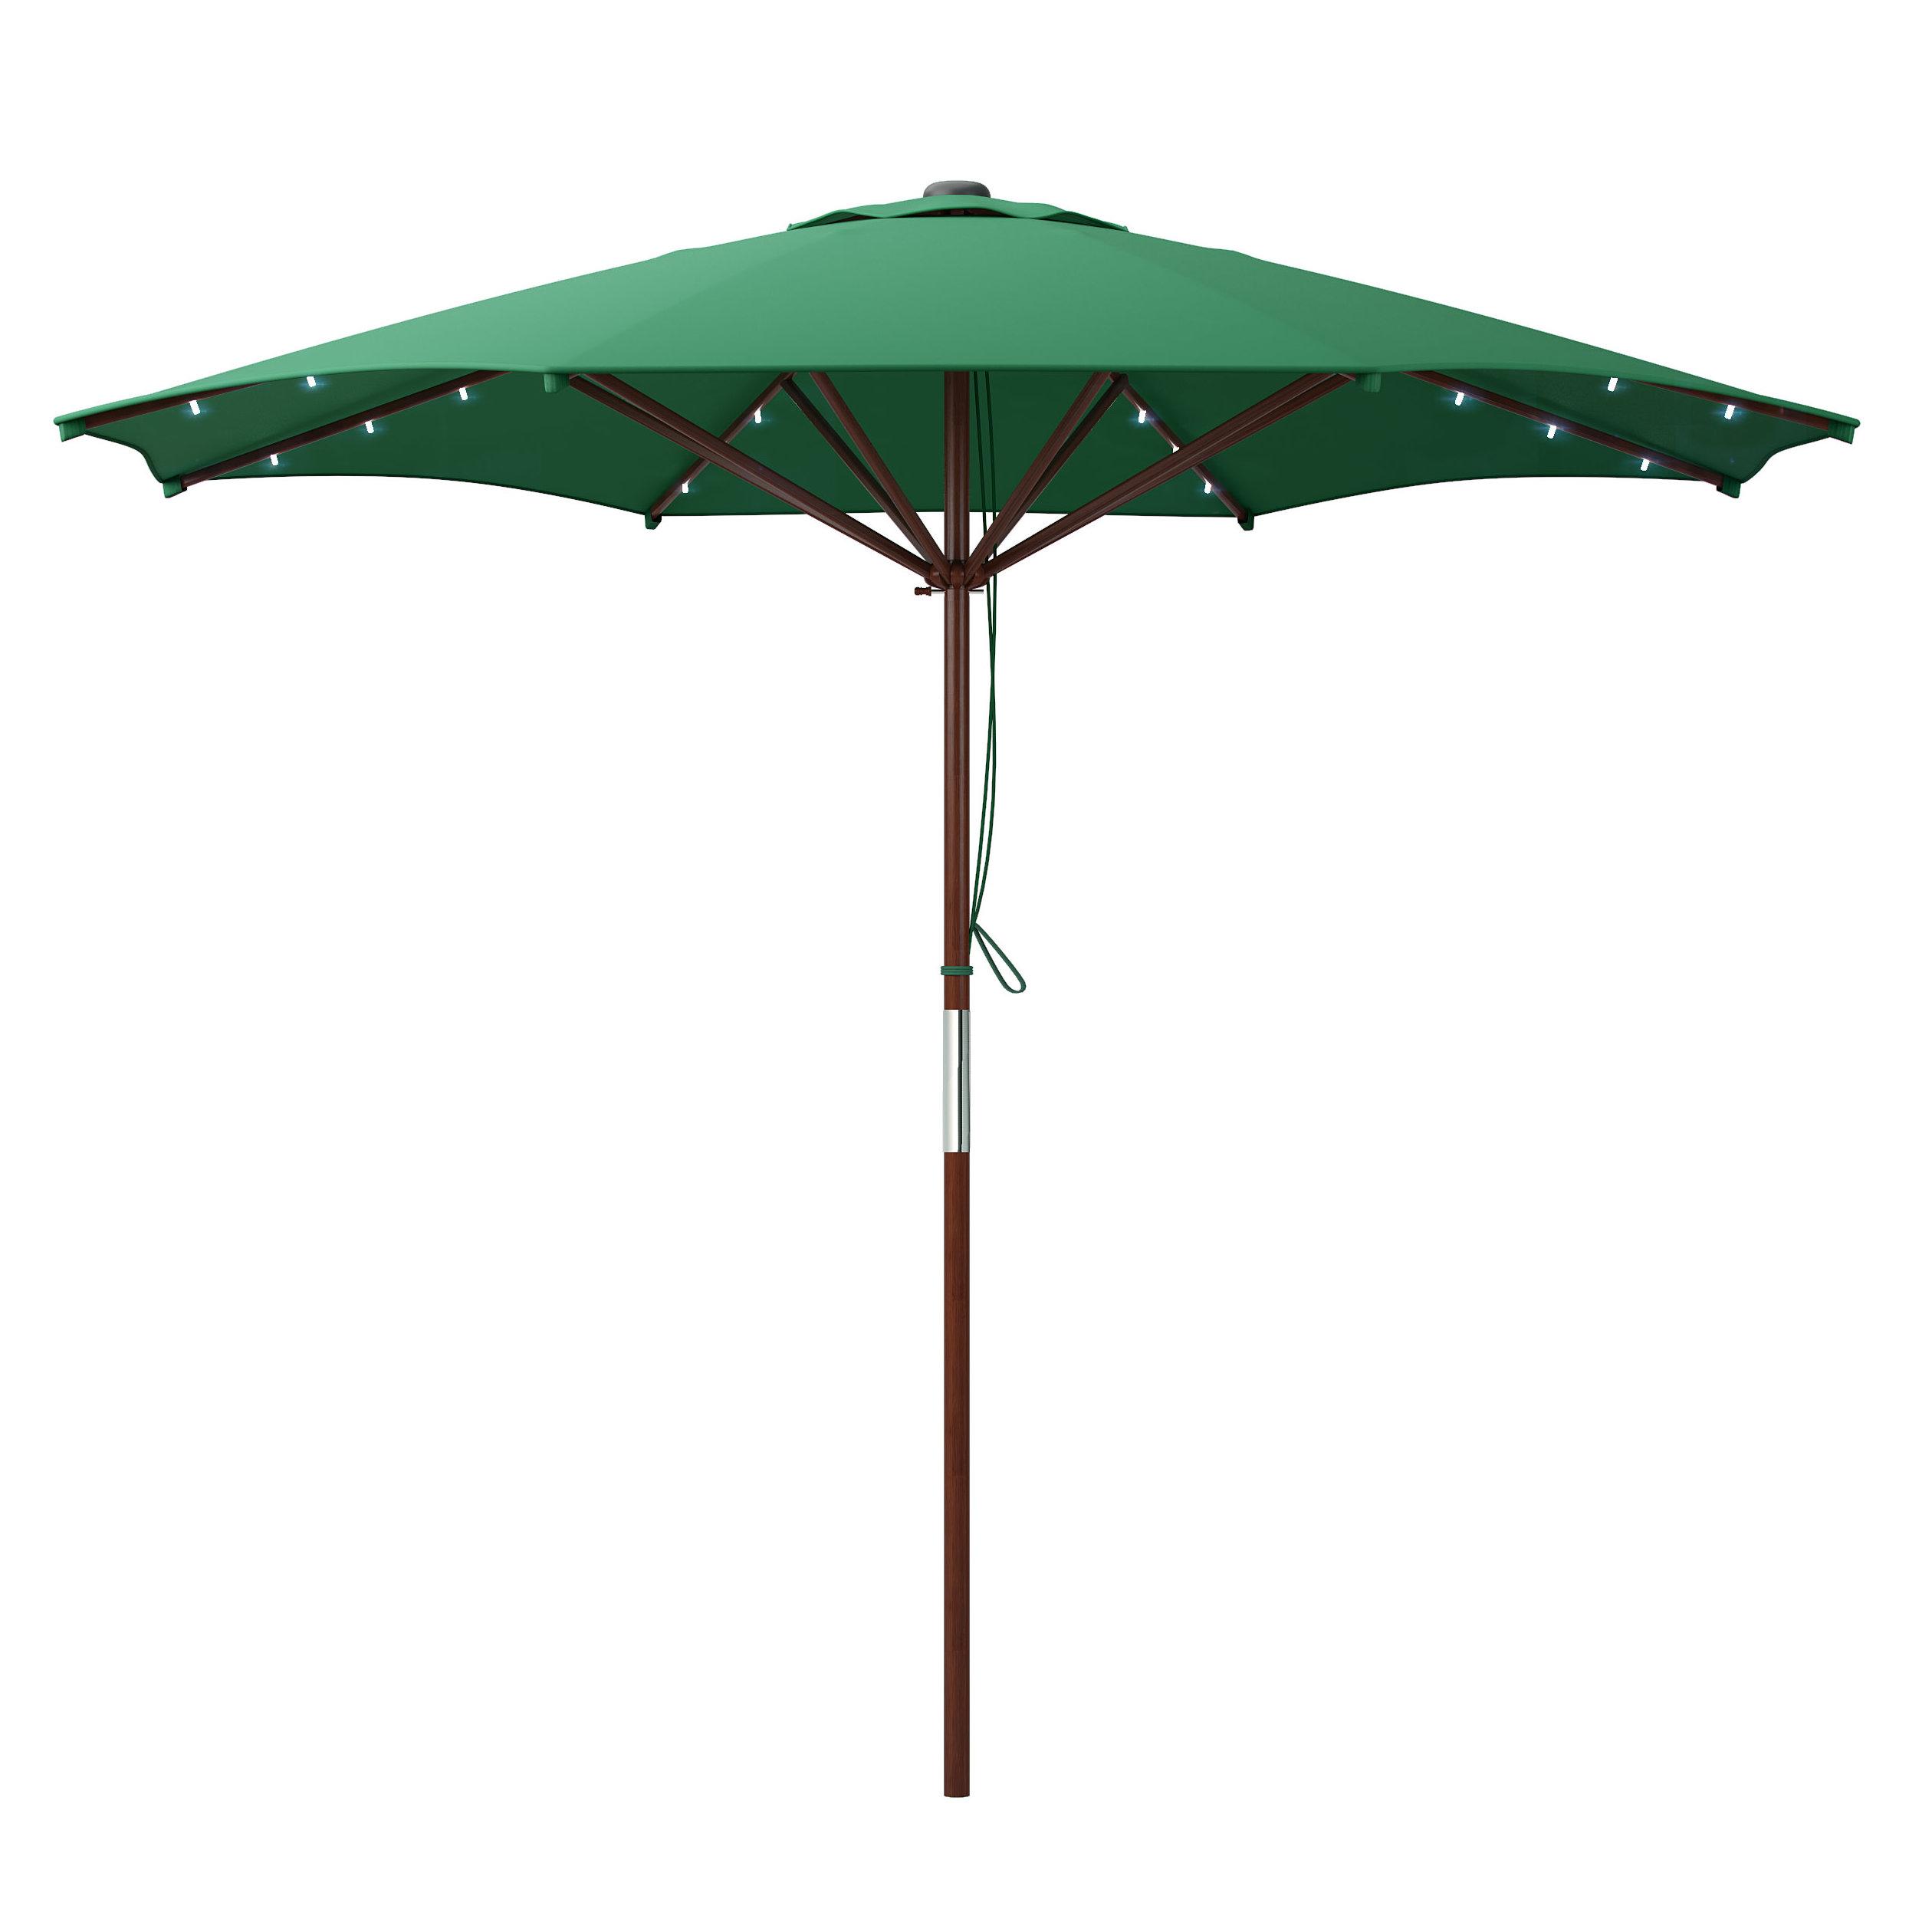 Deforge 9' Illuminated Umbrella Throughout Most Current Winchester Zipcode Design Market Umbrellas (View 4 of 20)